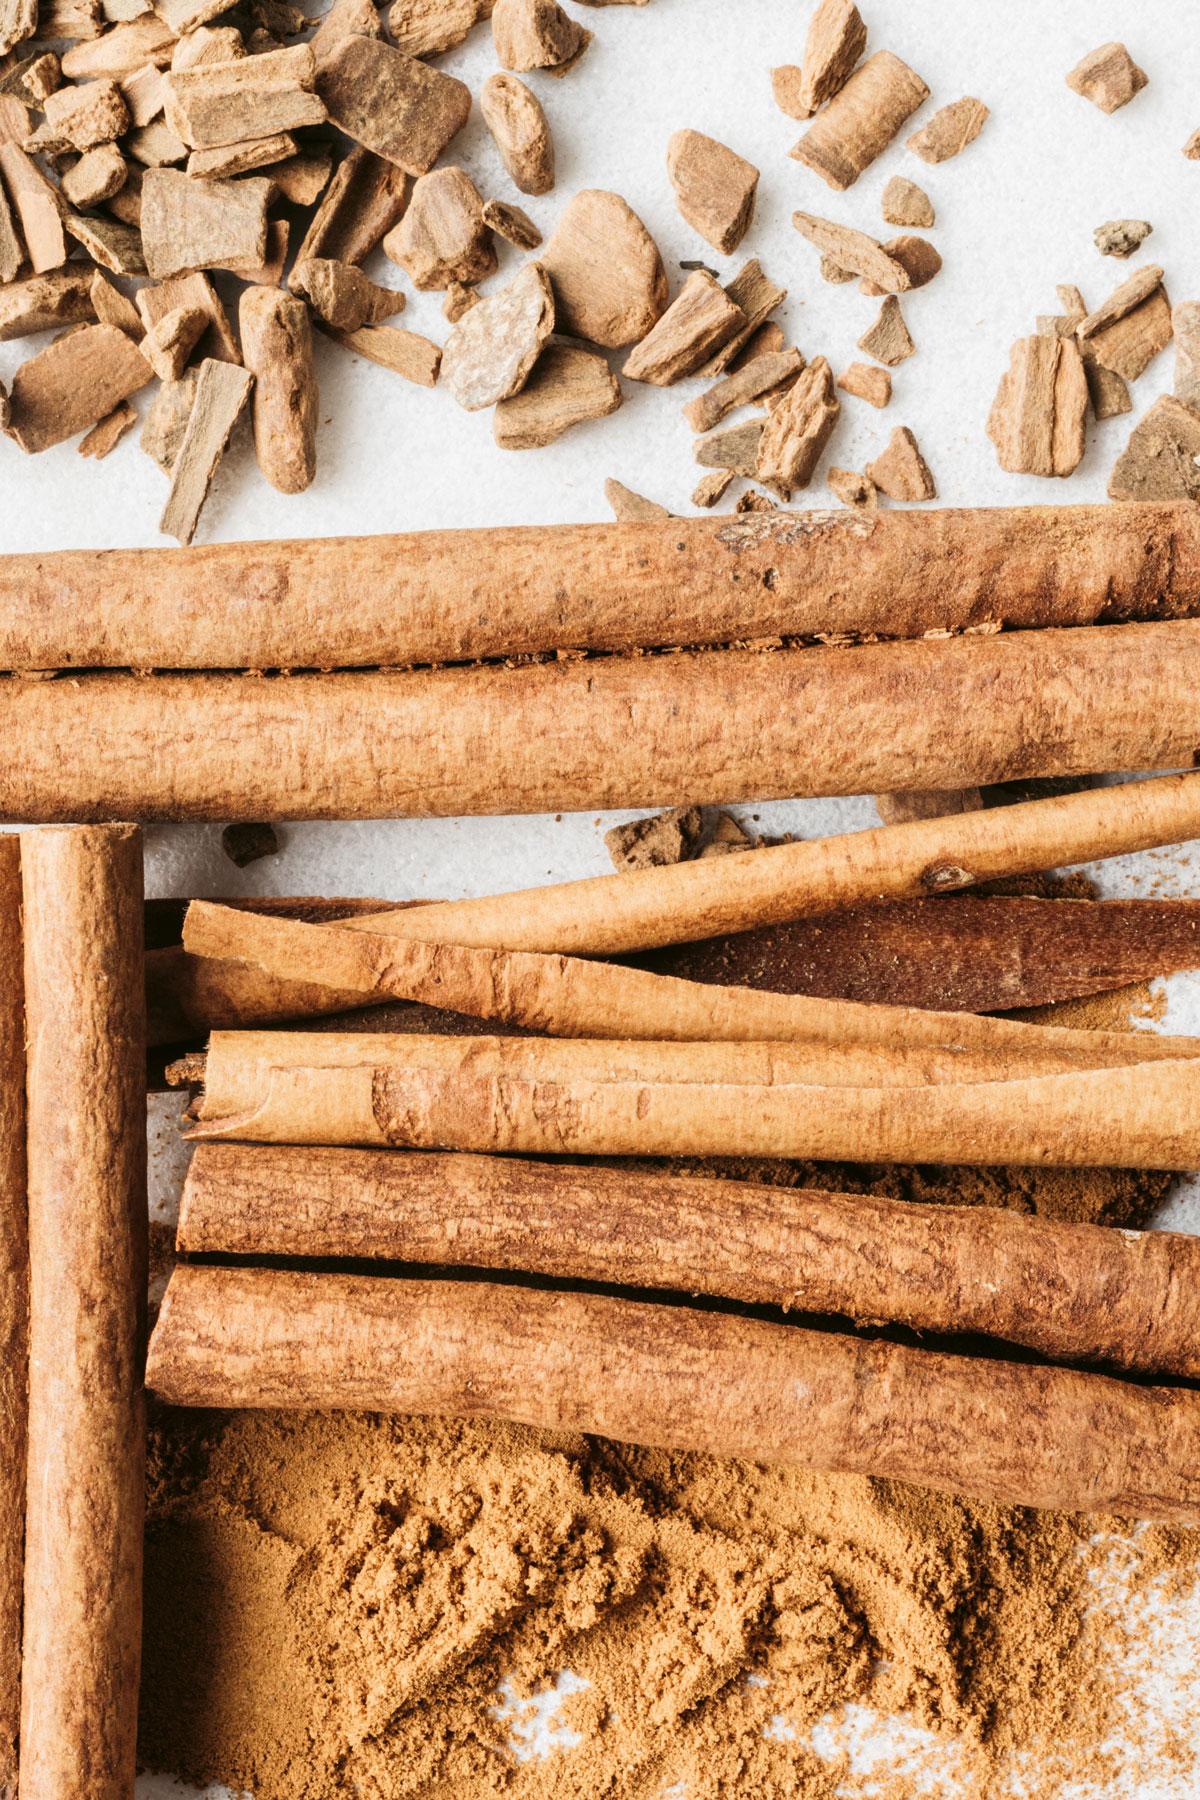 Explore the health benefits of cinnamon